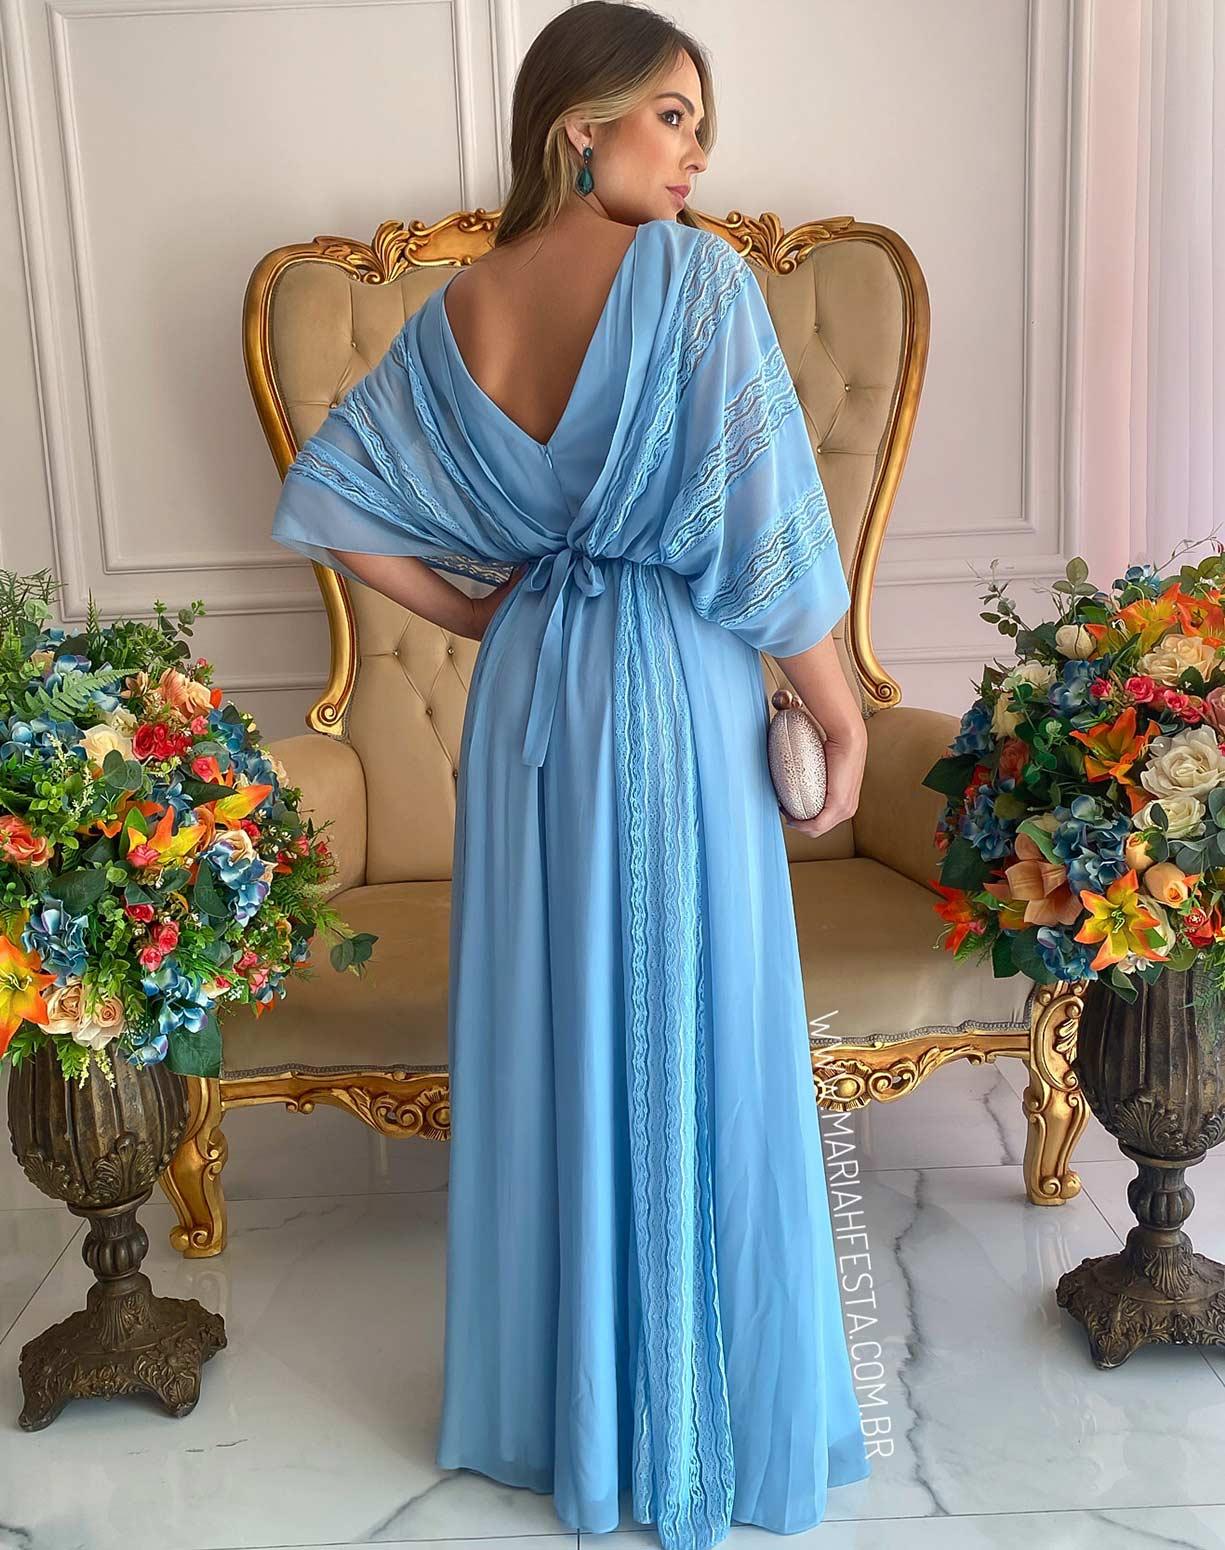 Vestido Azul Serenity em Renda e Chifon de Seda